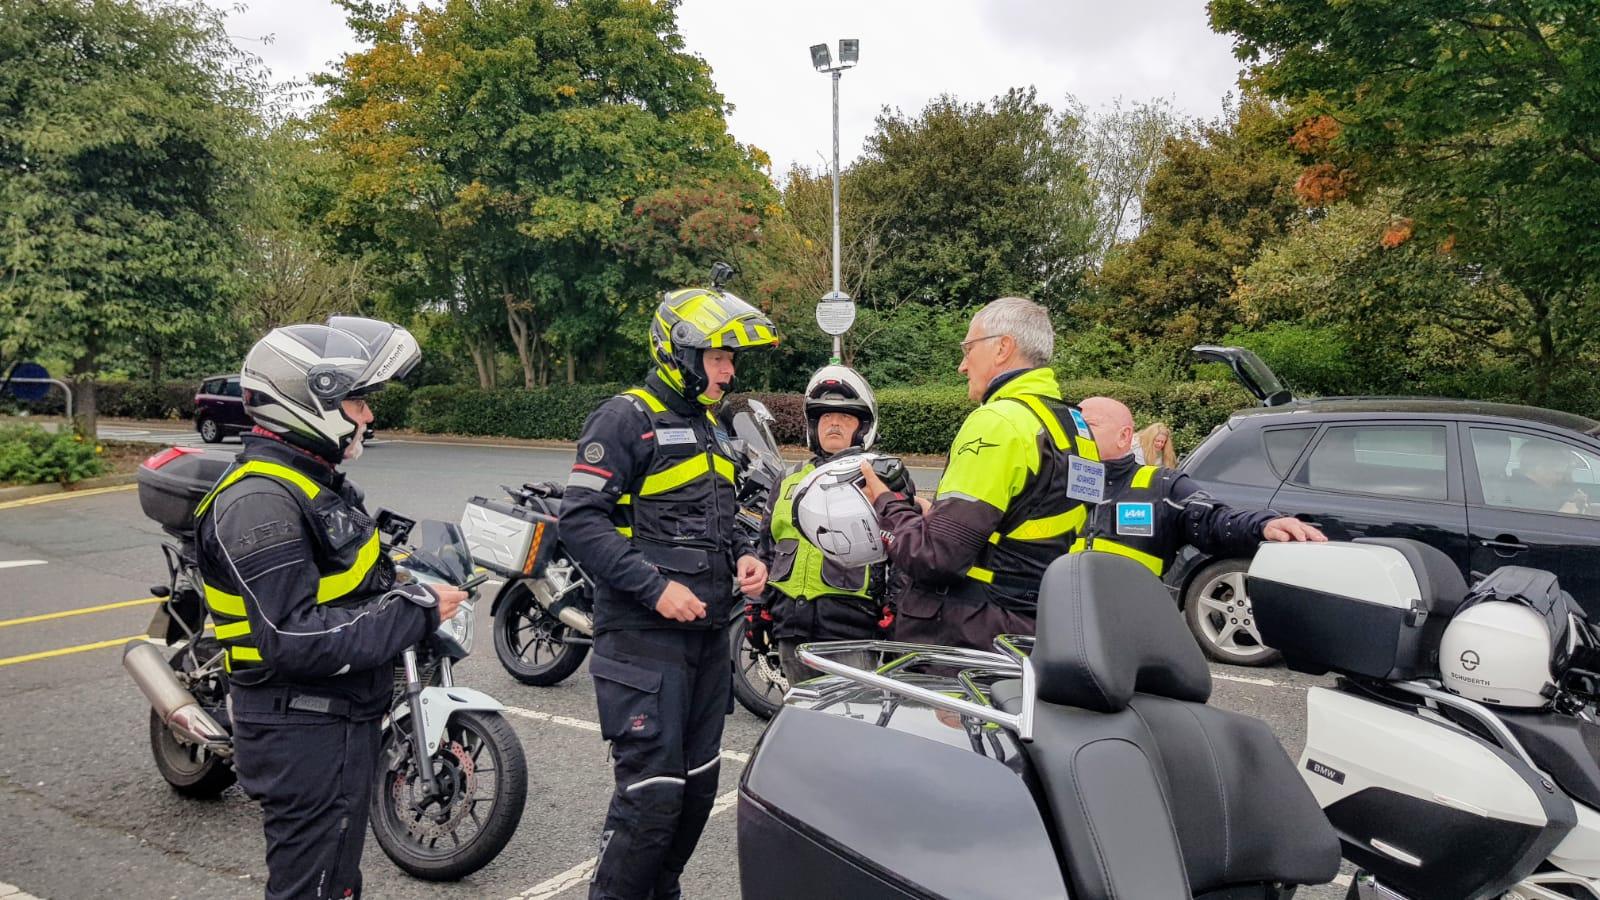 Motorcycle meet with IAM RoadSmart